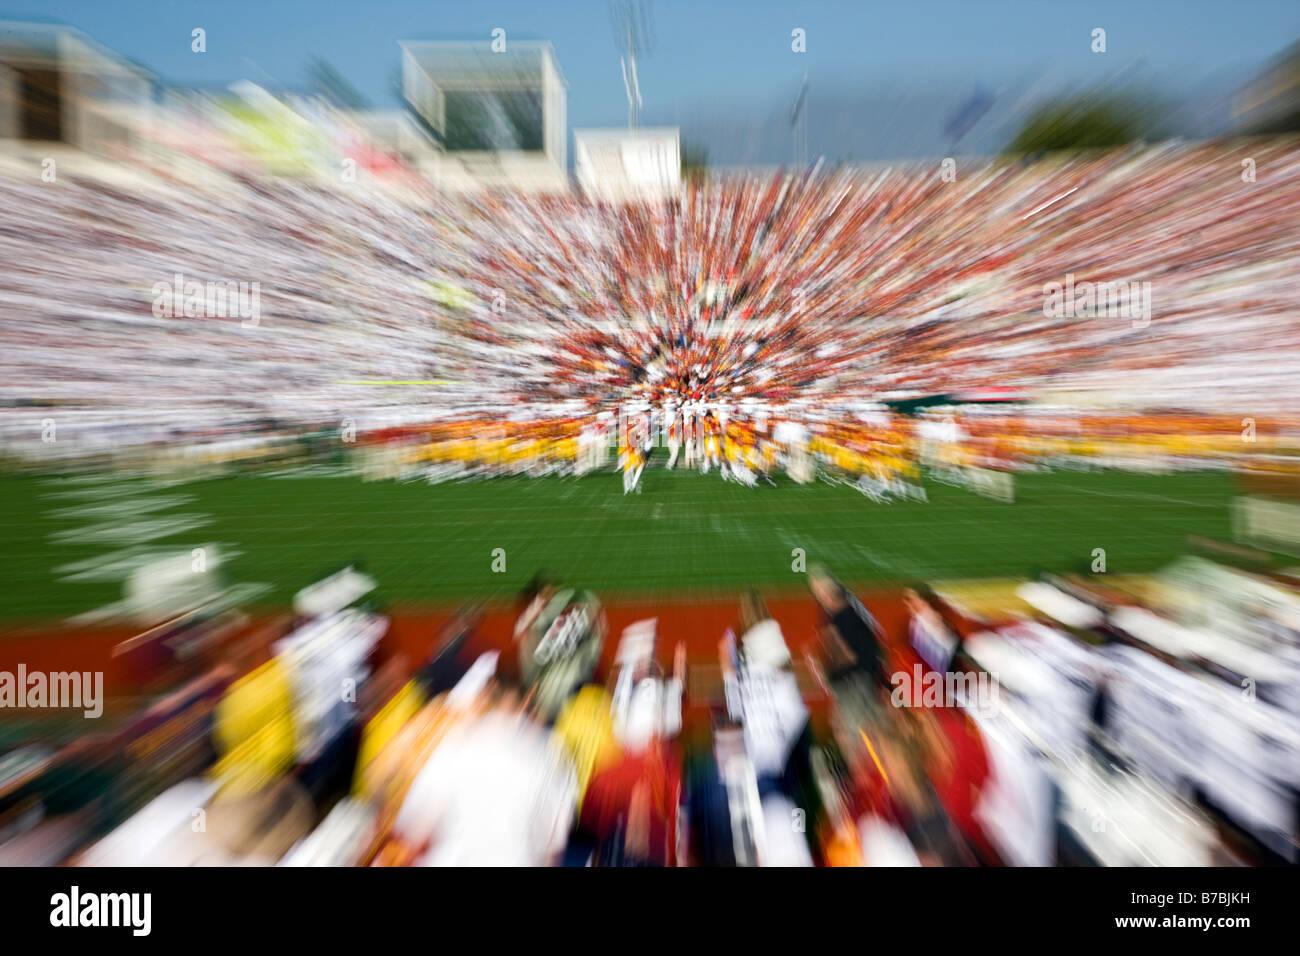 Annual New Years Day Rose Bowl football game.  USC versus PSU, Pasadena, California, USA - Stock Image